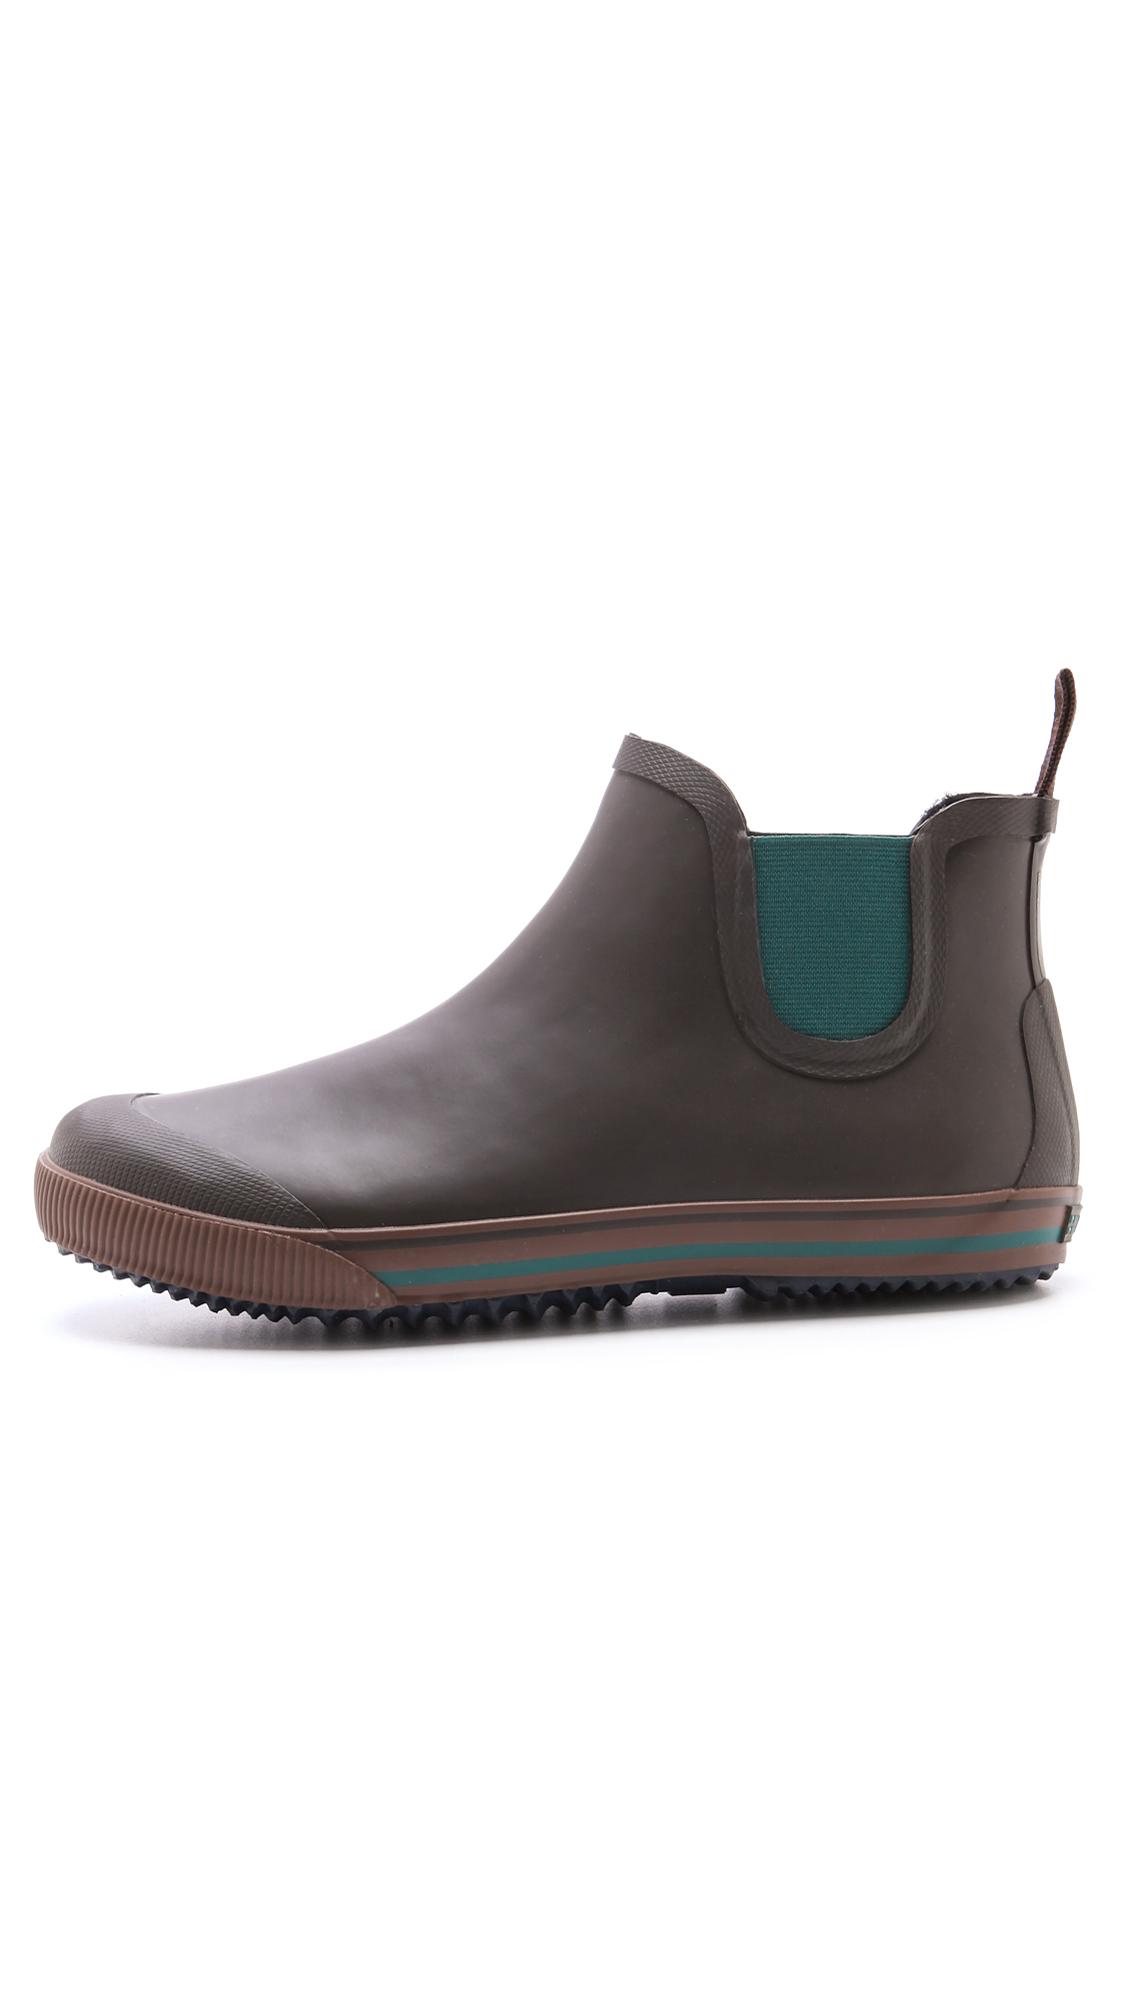 Tretorn Strala Vinter Boots In Brown For Men Lyst